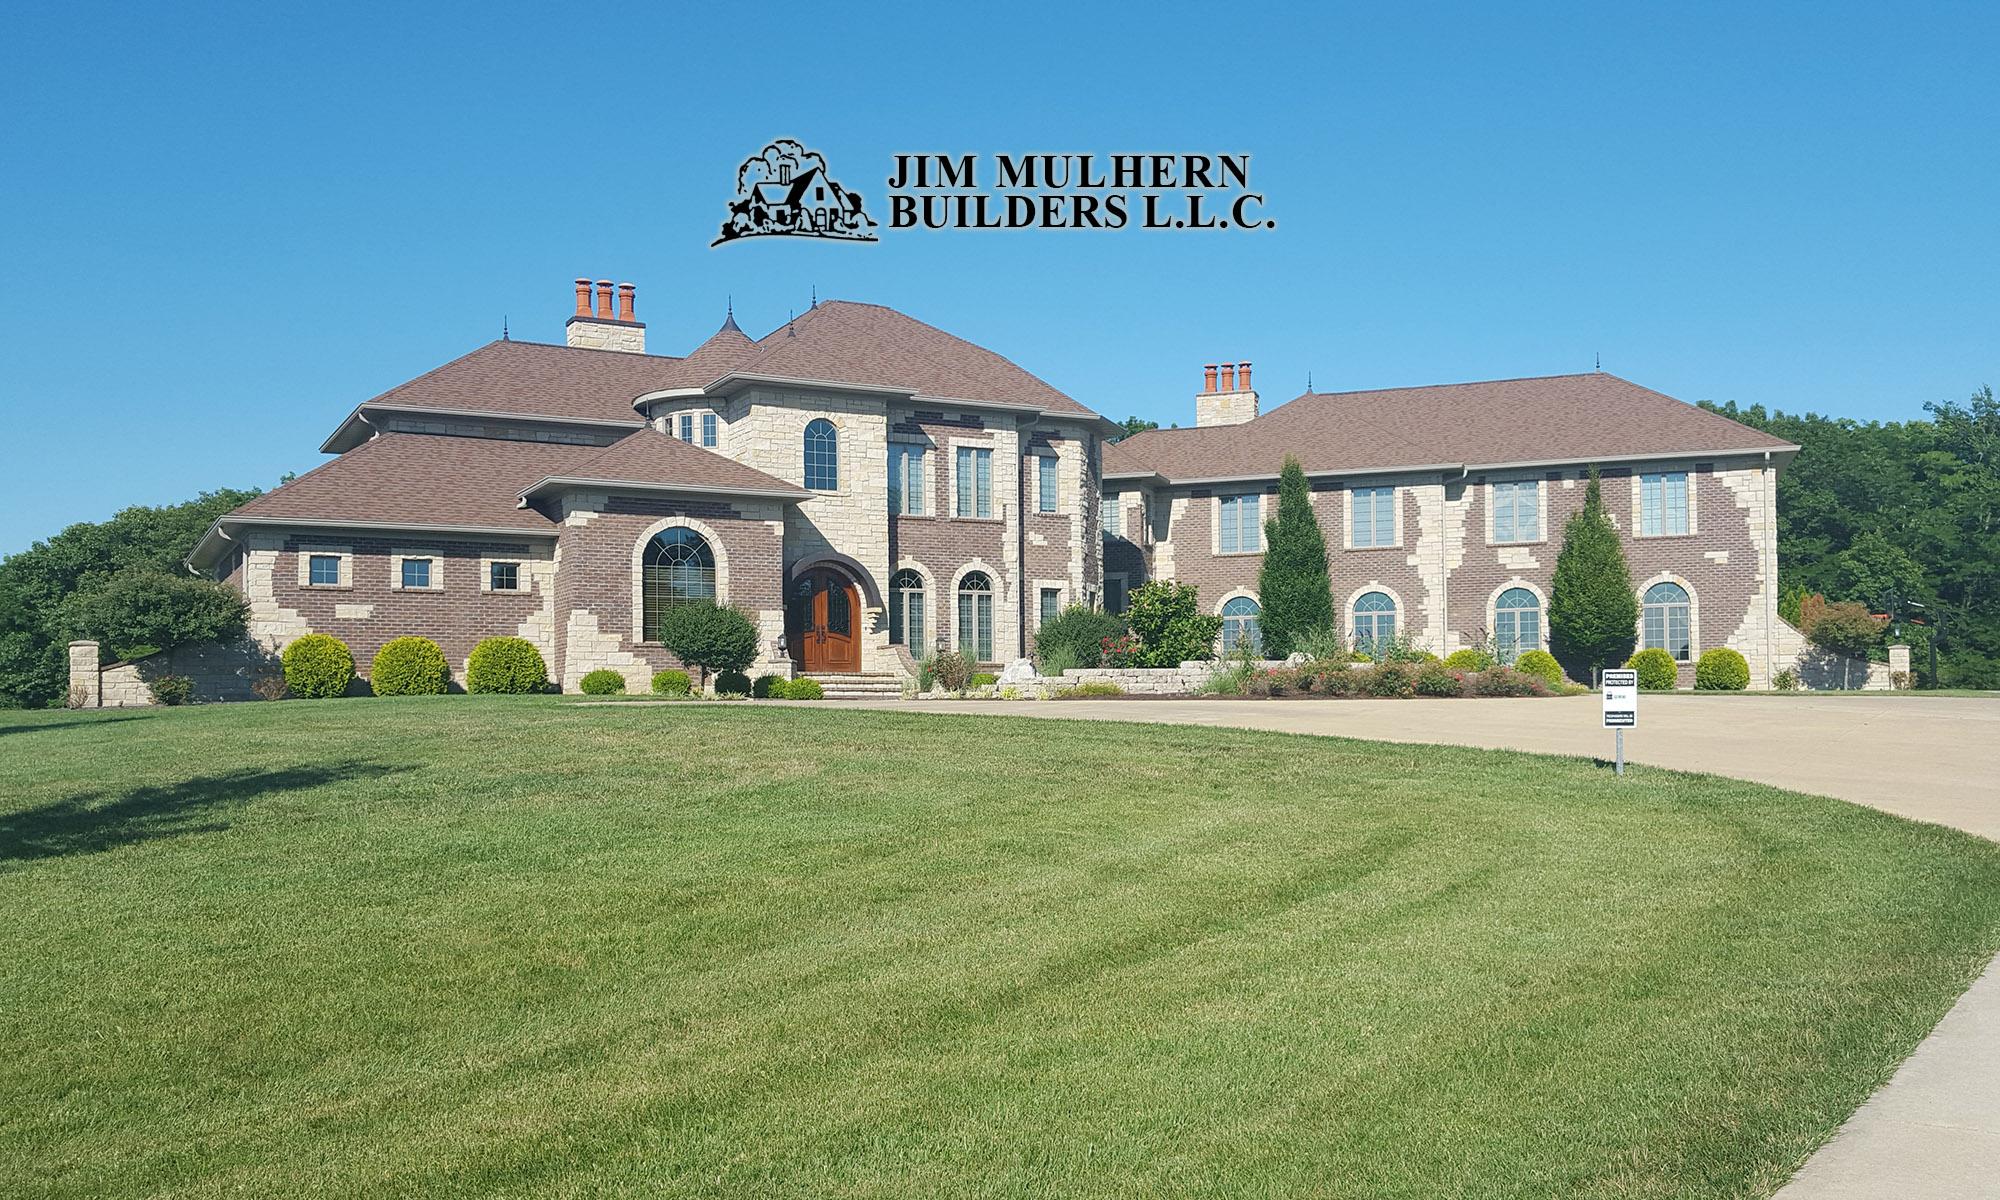 Jim Mulhern Builders L L C Custom Homes Lots In The